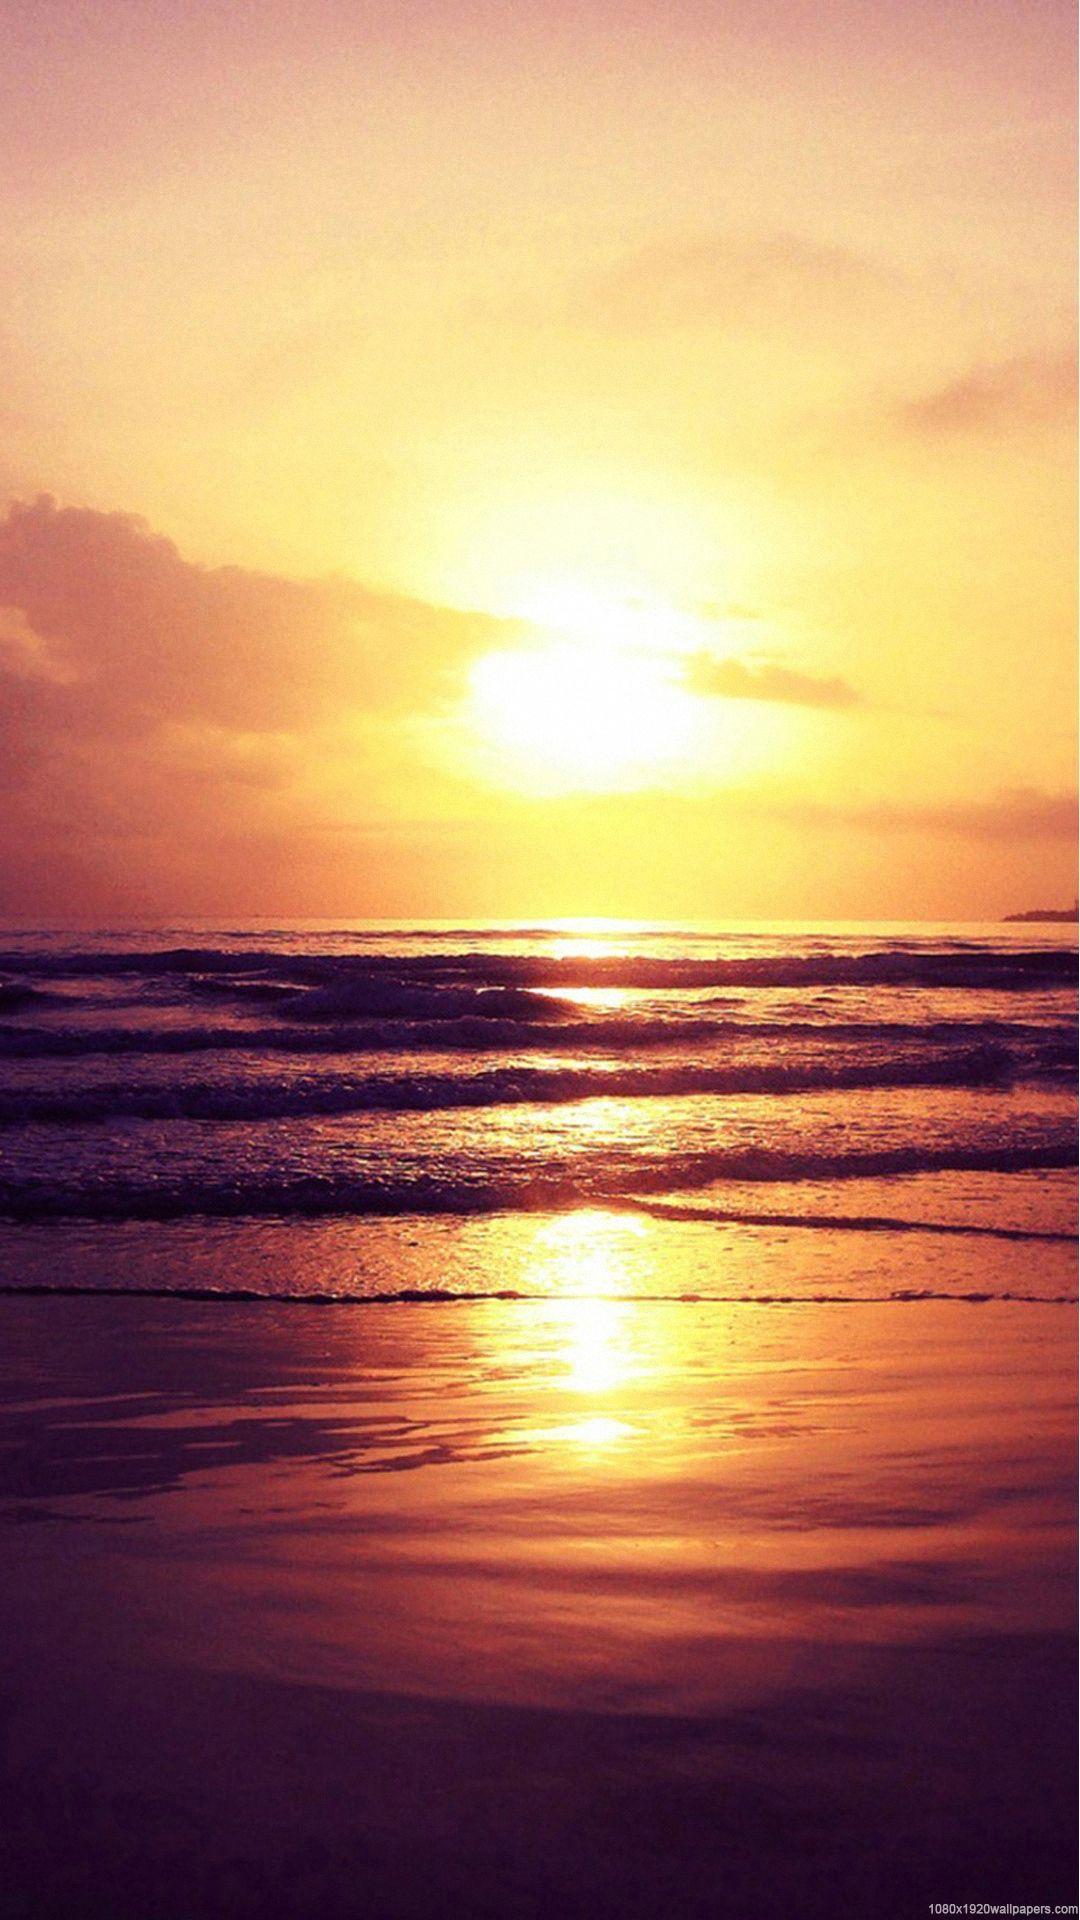 Vertical Sunset Wallpapers - Top Free Vertical Sunset ...